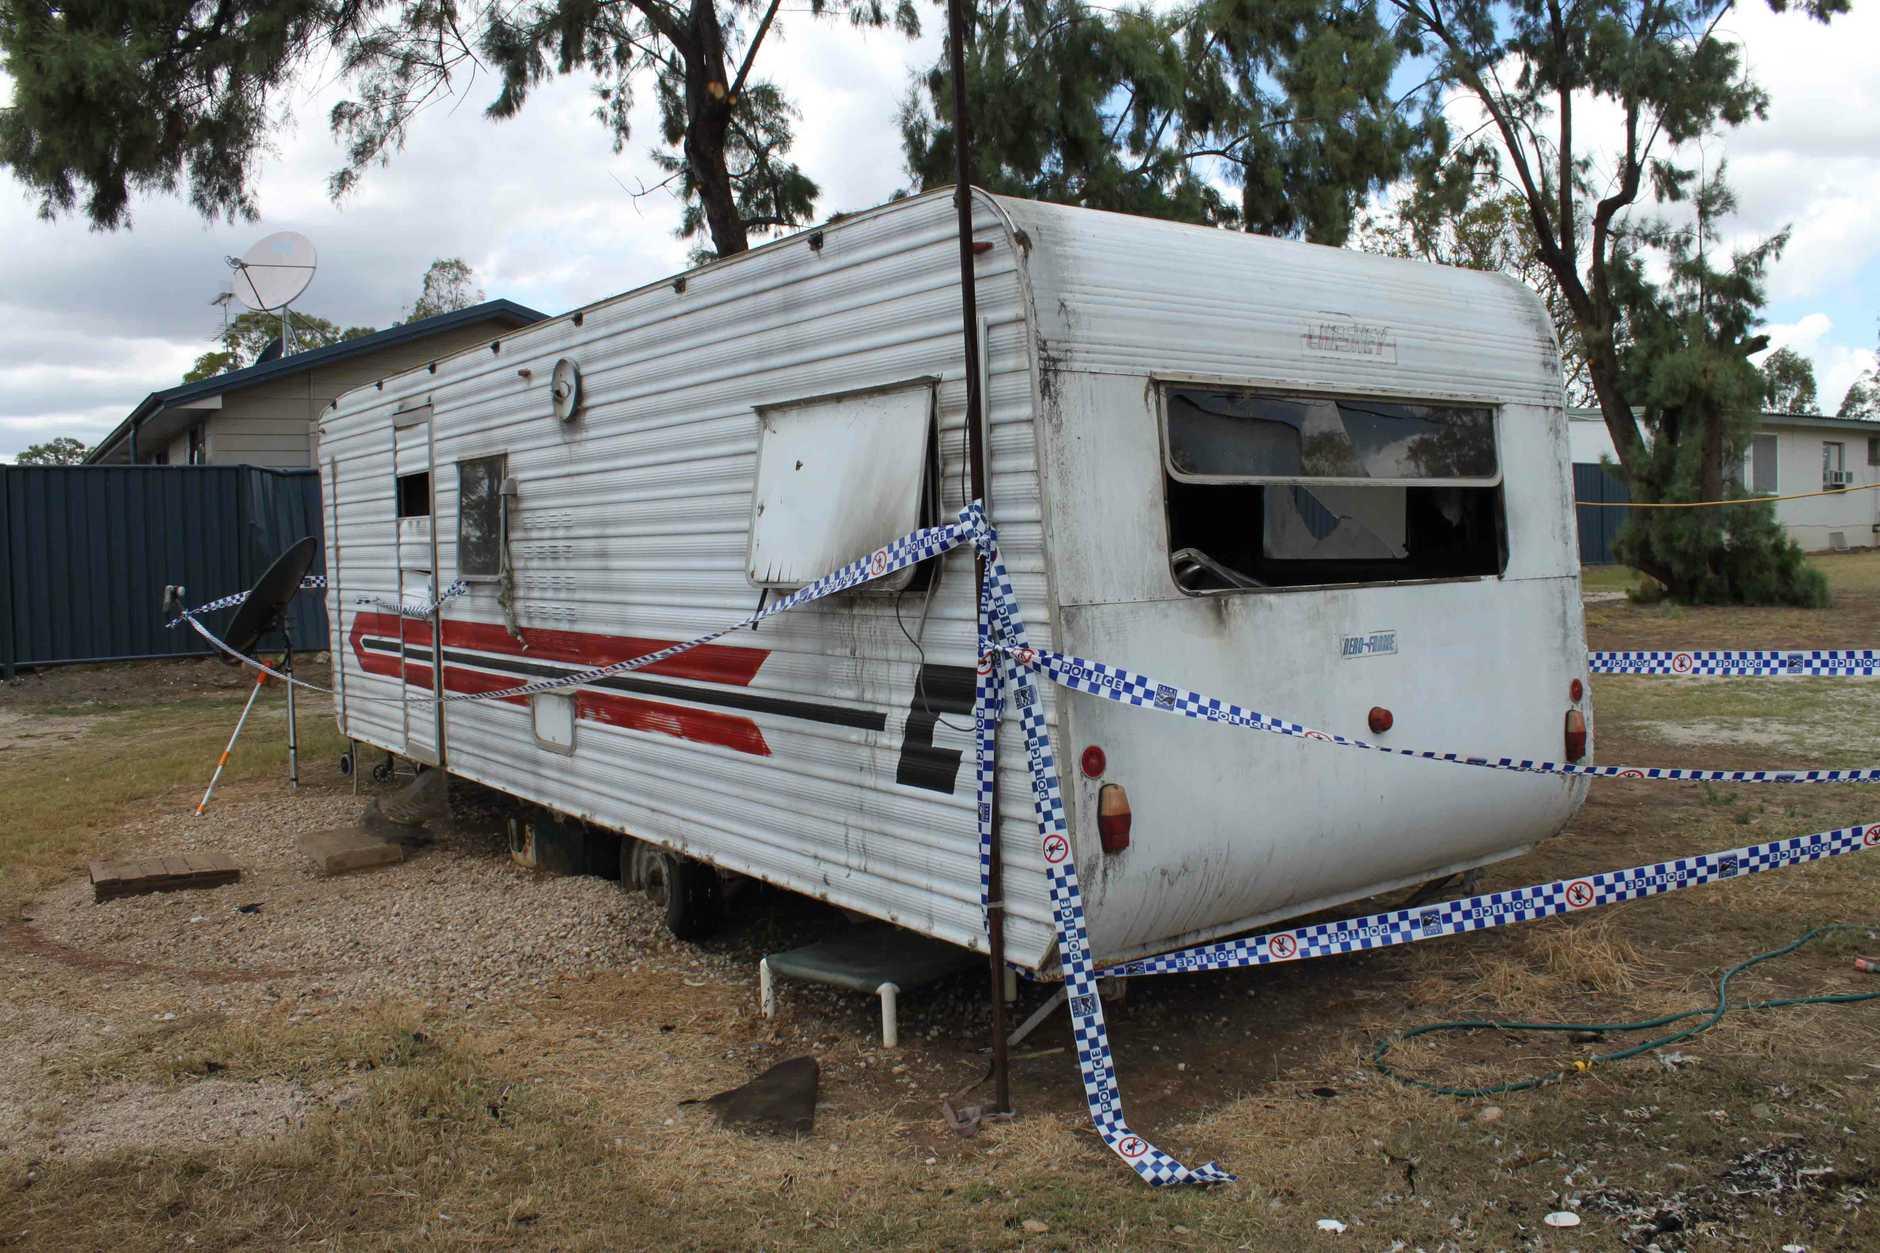 Frank Murray's caravan